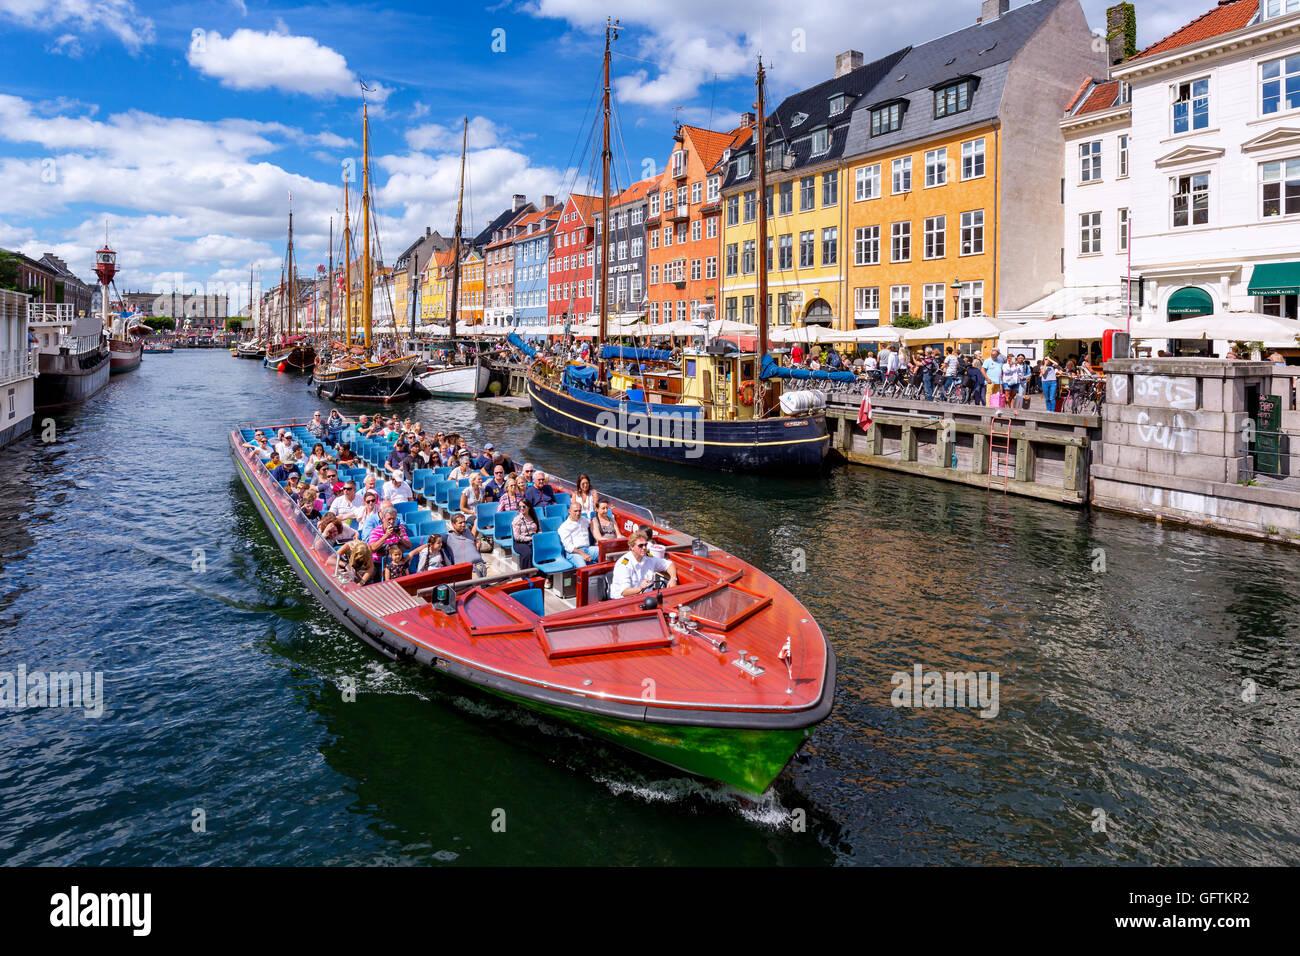 Excursion boat, Nyhavn canal, Copenhagen, Denmark Stock Photo